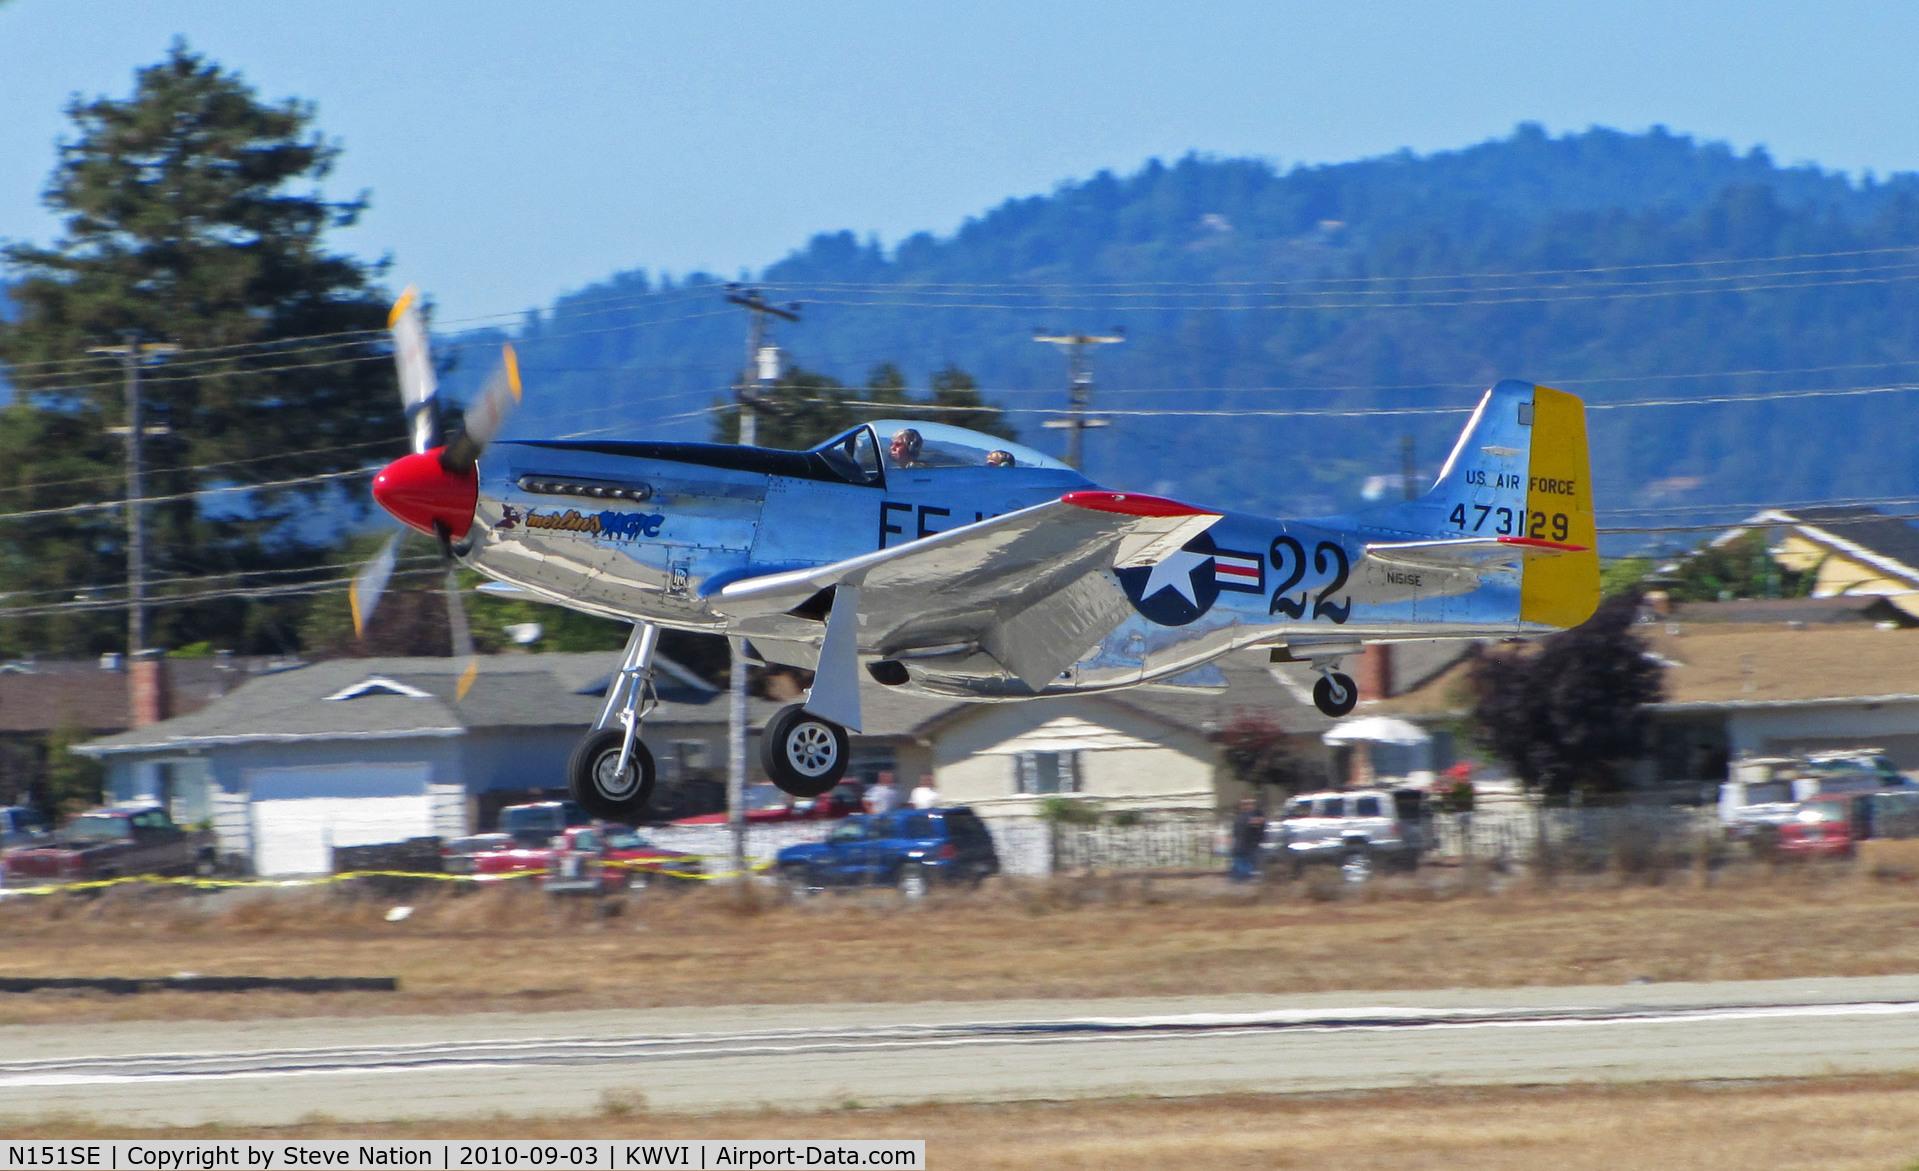 N151SE, 1944 North American P-51D Mustang C/N 122-39588 (44-73129), 1944 P-51D 44-35972 44-73129 U.S. Air Force FF-129 #22 'Merlin's Magic